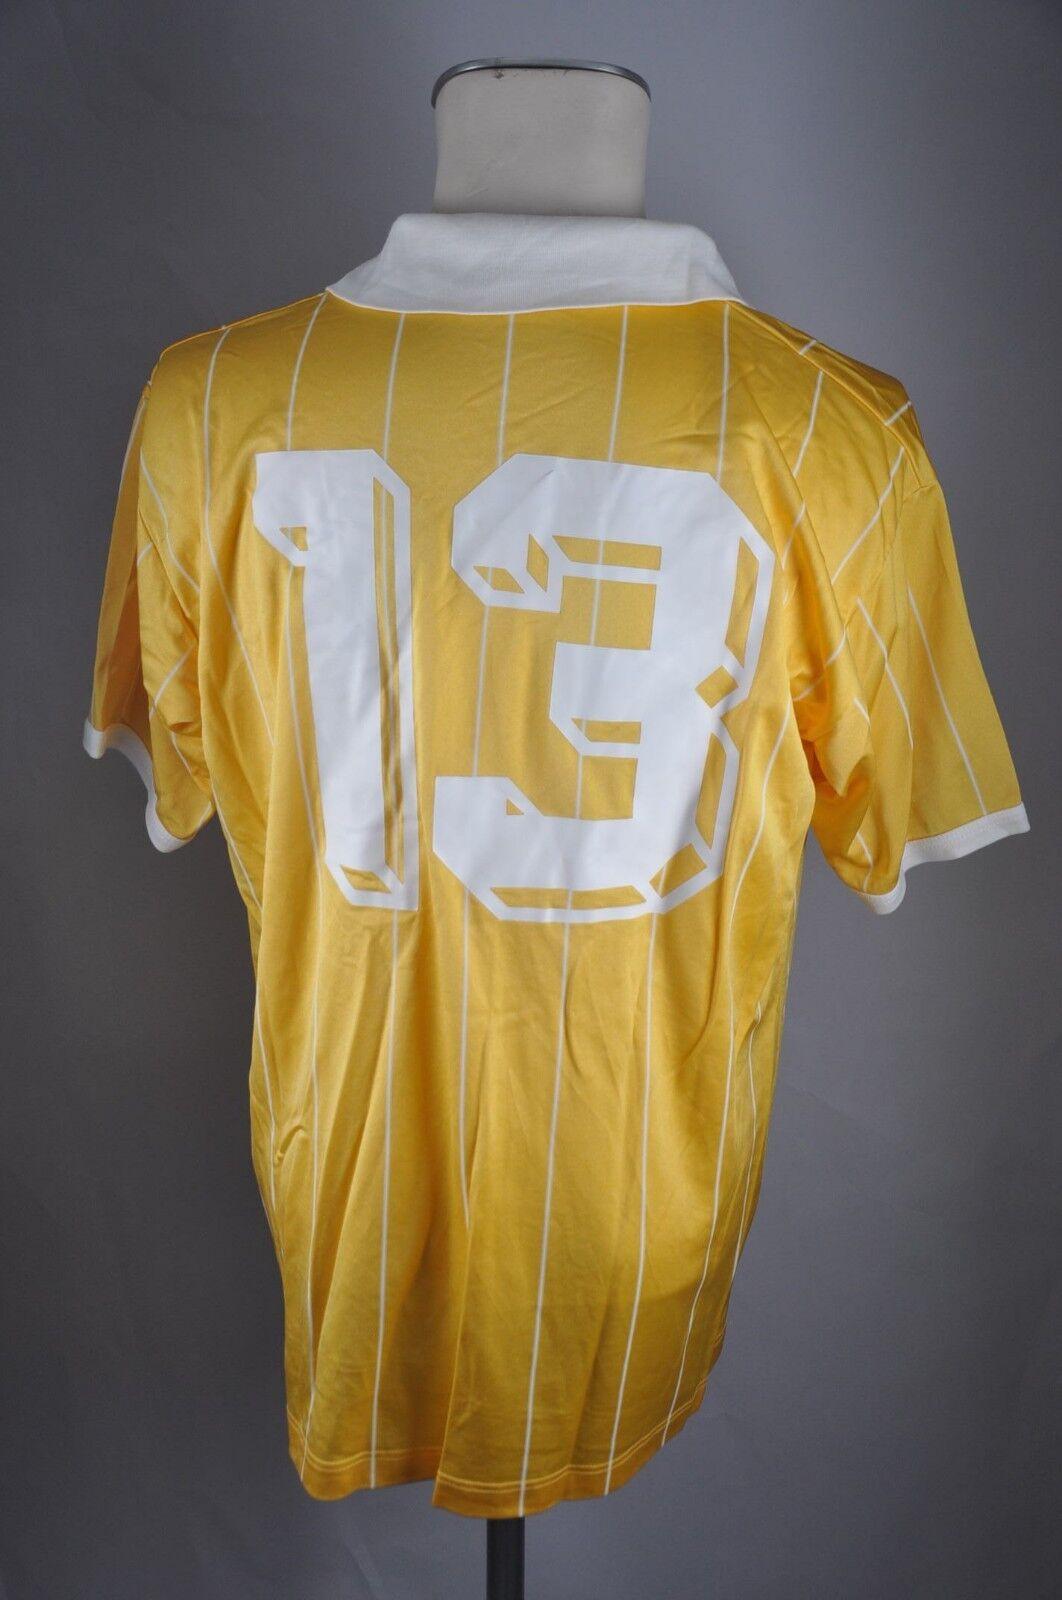 Virma Virma Virma vintage Shirt jersey Trikot 80er 80s Shirt  Gr. 5 - L  13  VA6 15d896